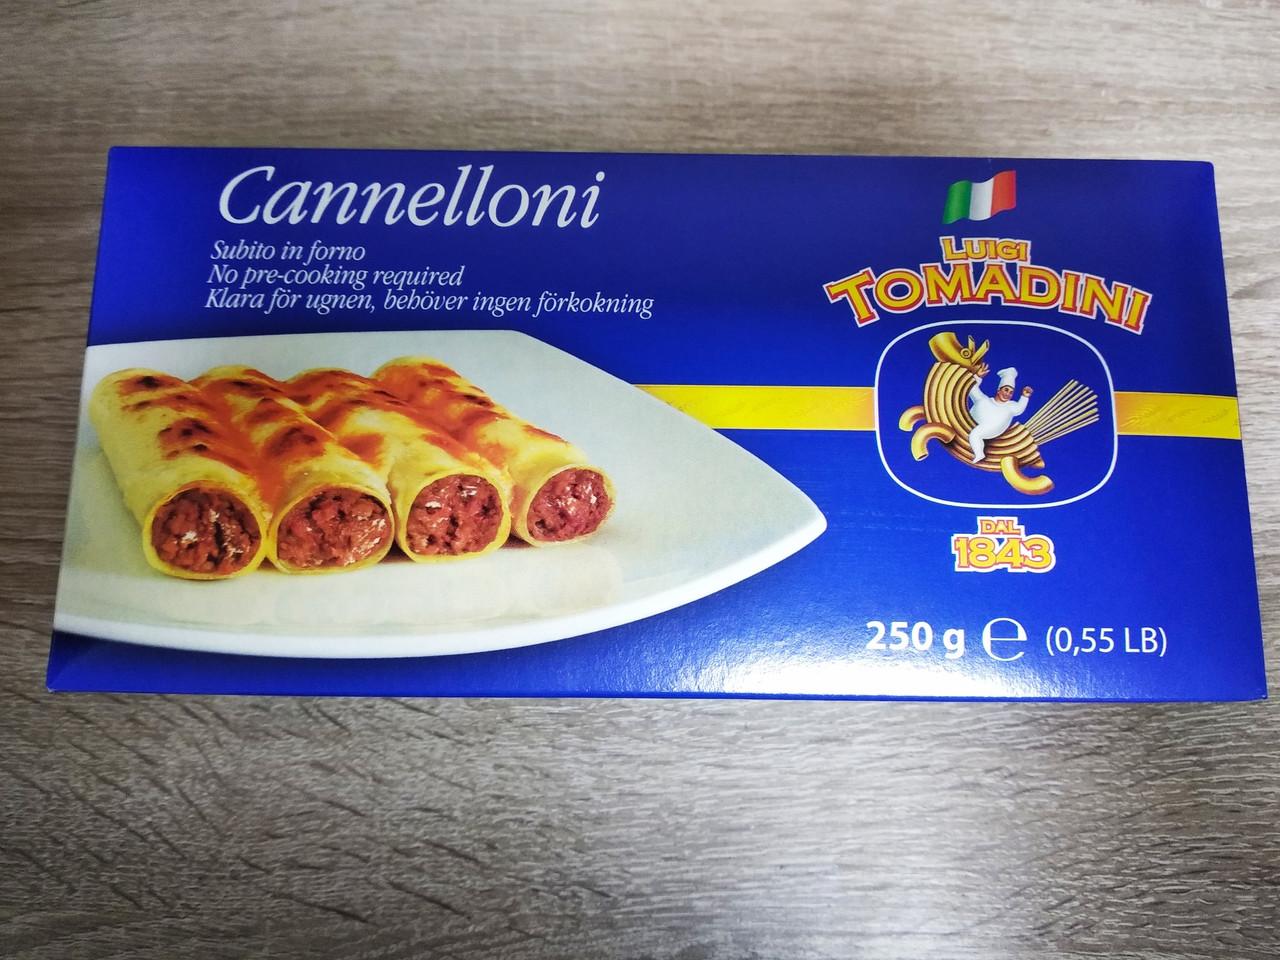 Каннеллоні Luigi tomadini cannelloni 250 гр.